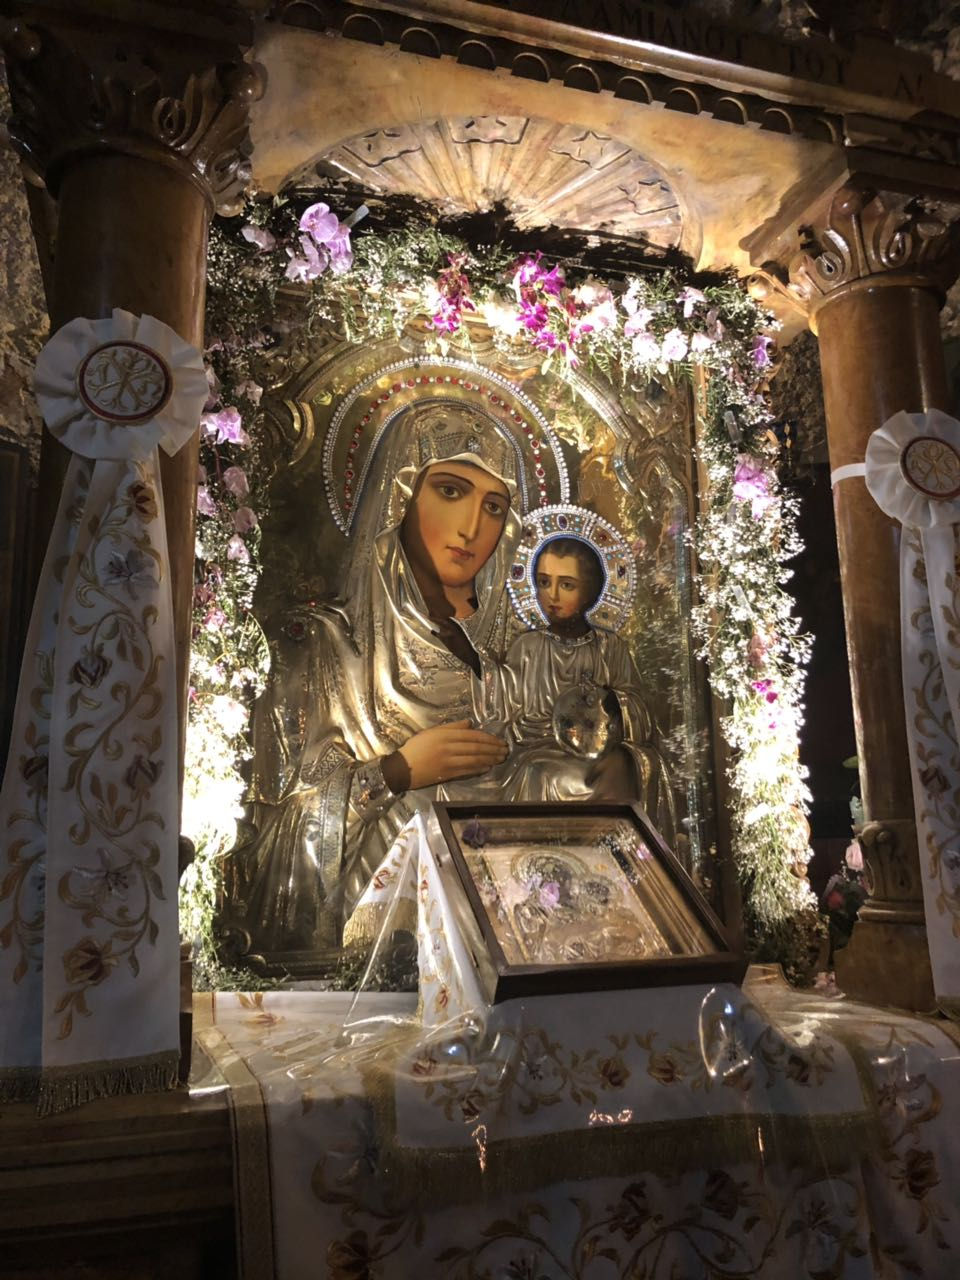 ierosolyma2019 14 - Λαρισαίοι Προσκυνητές Στην Αγία Γη Των Ιεροσολύμων (φωτο)